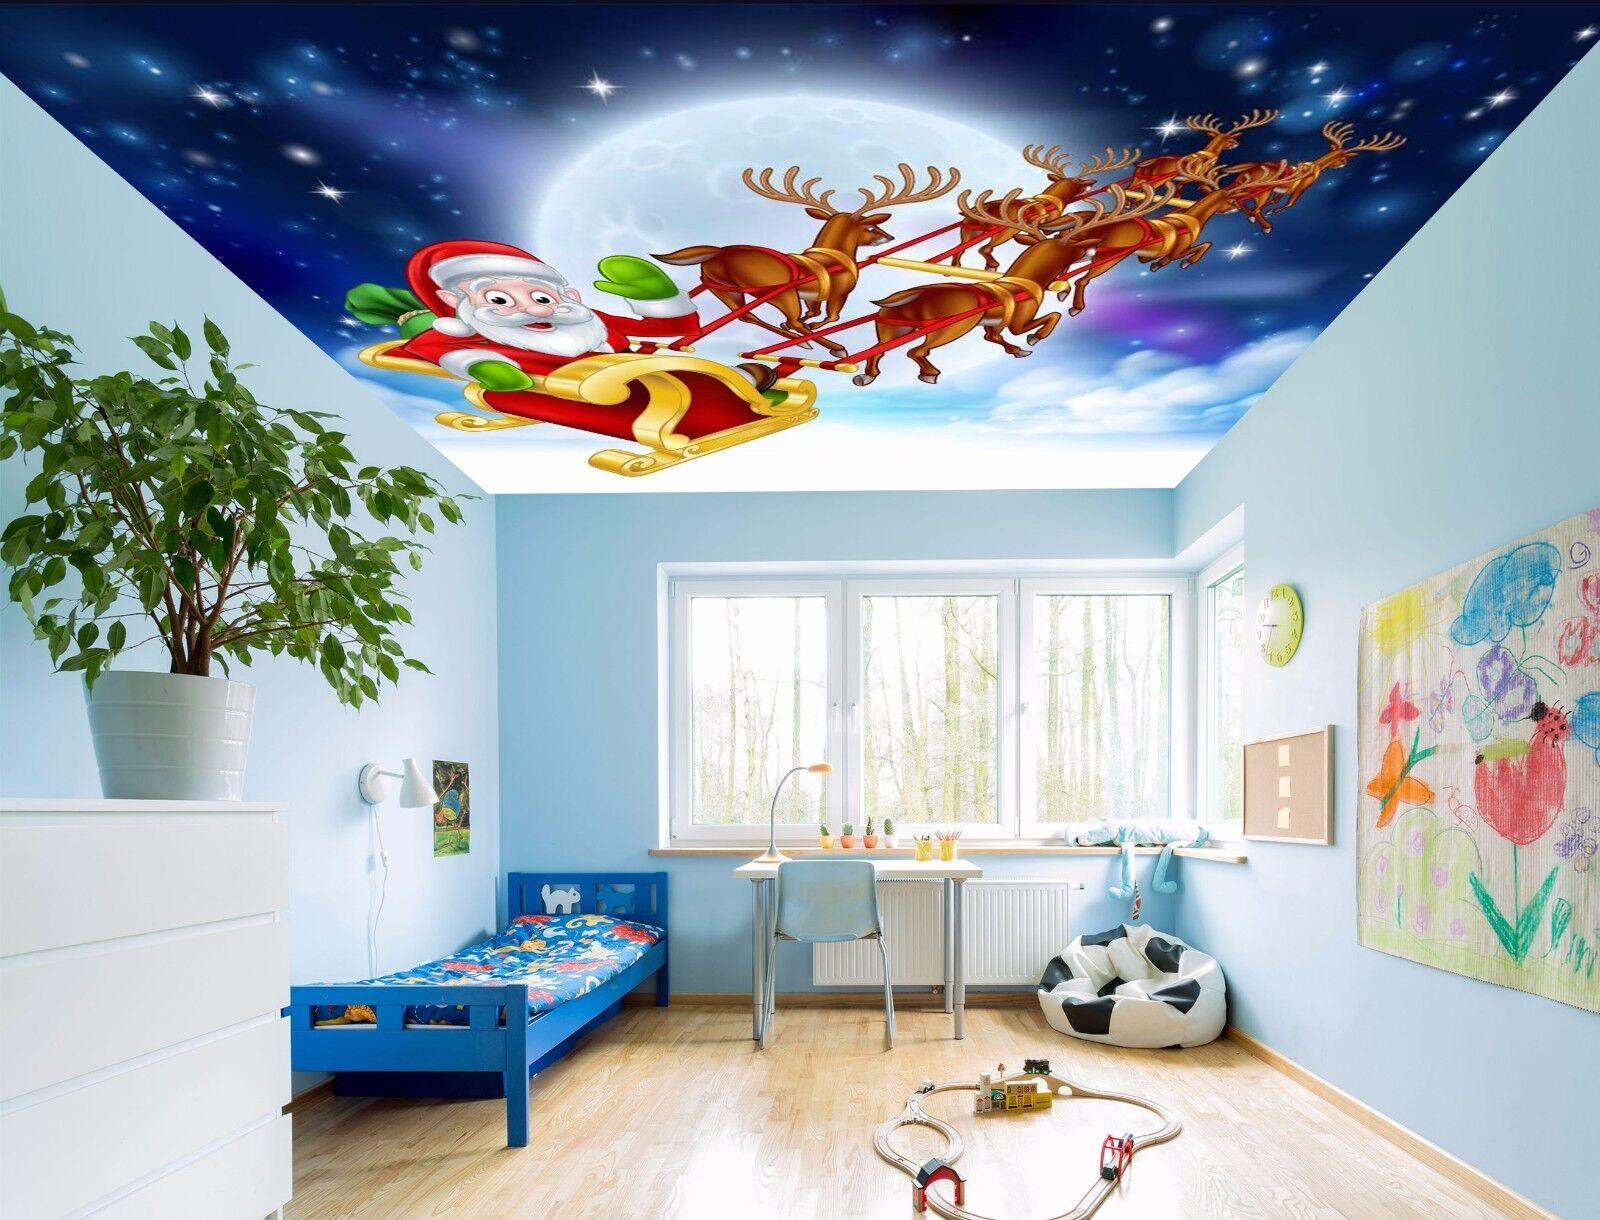 3D Moon Snow Ceiling WallPaper Murals Wall Print Decal Deco AJ WALLPAPER AU